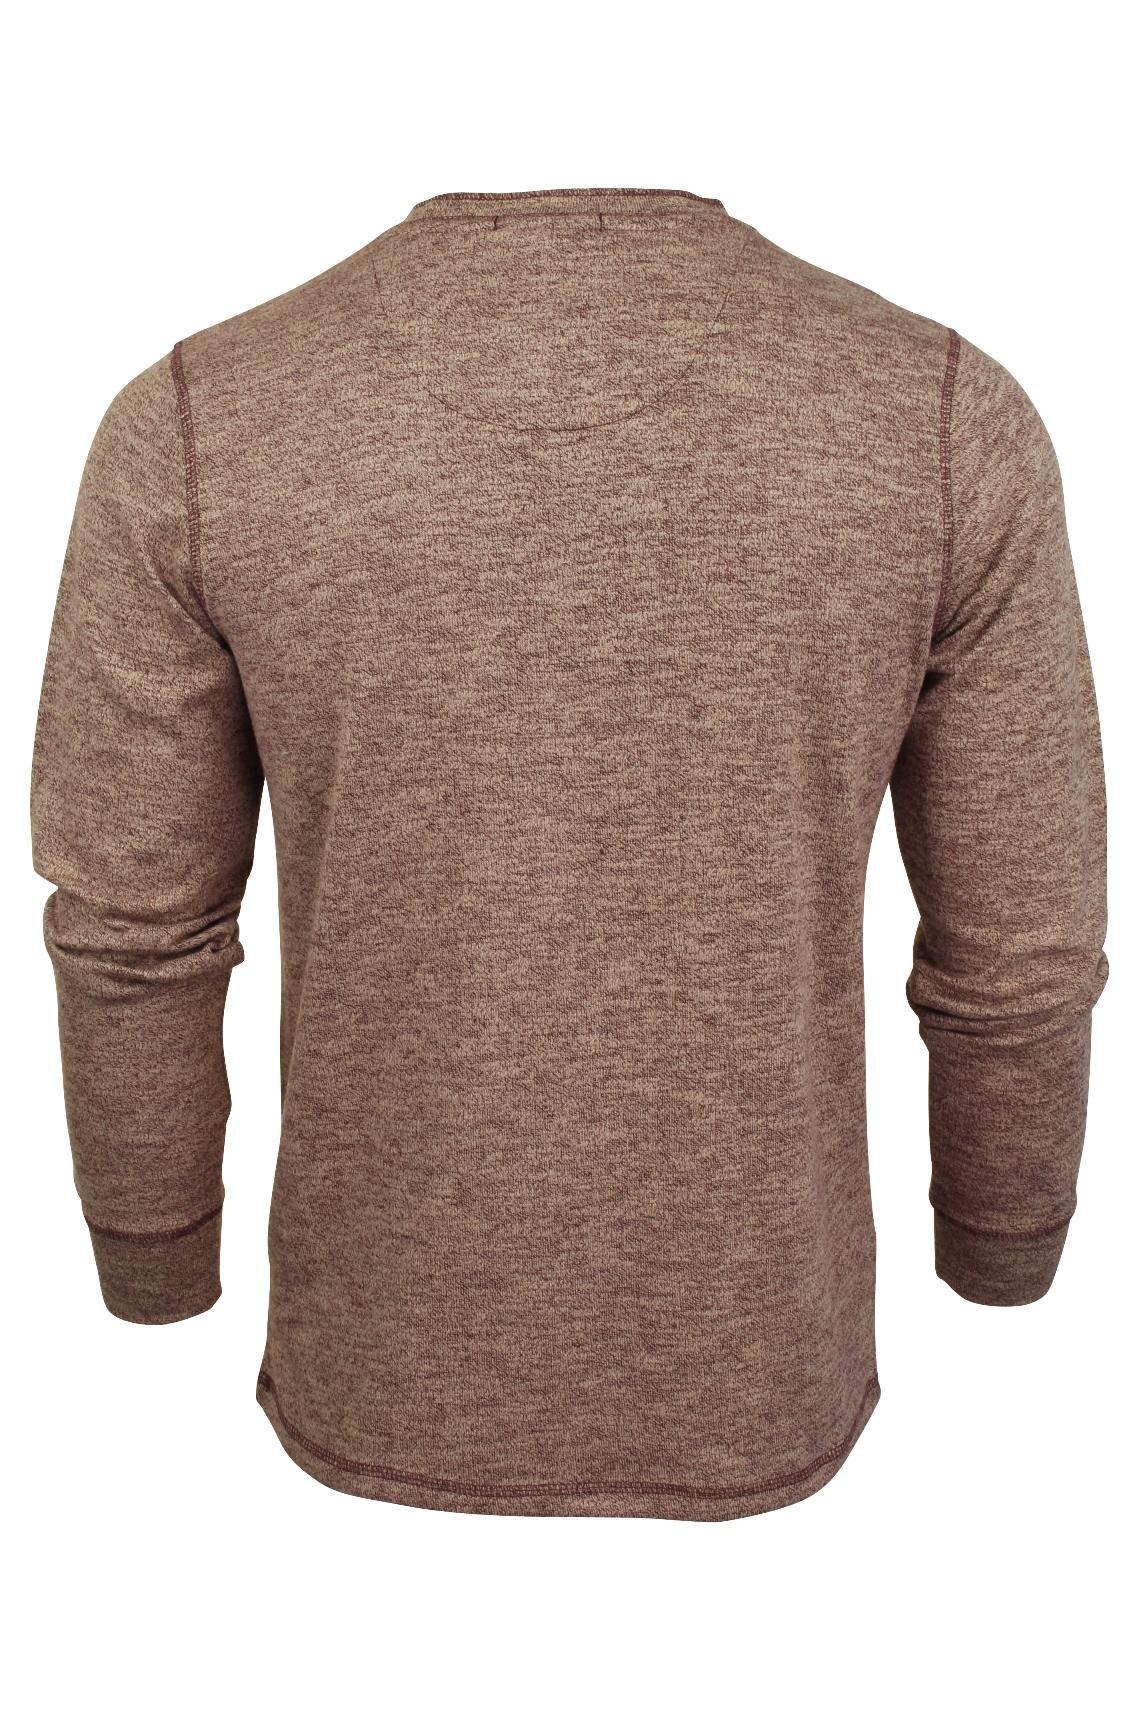 Mens-Long-Sleeve-Grandad-T-Shirt-by-Tokyo-Laundry-039-Roosevelt-039-Siro-Slub-Jersey thumbnail 11